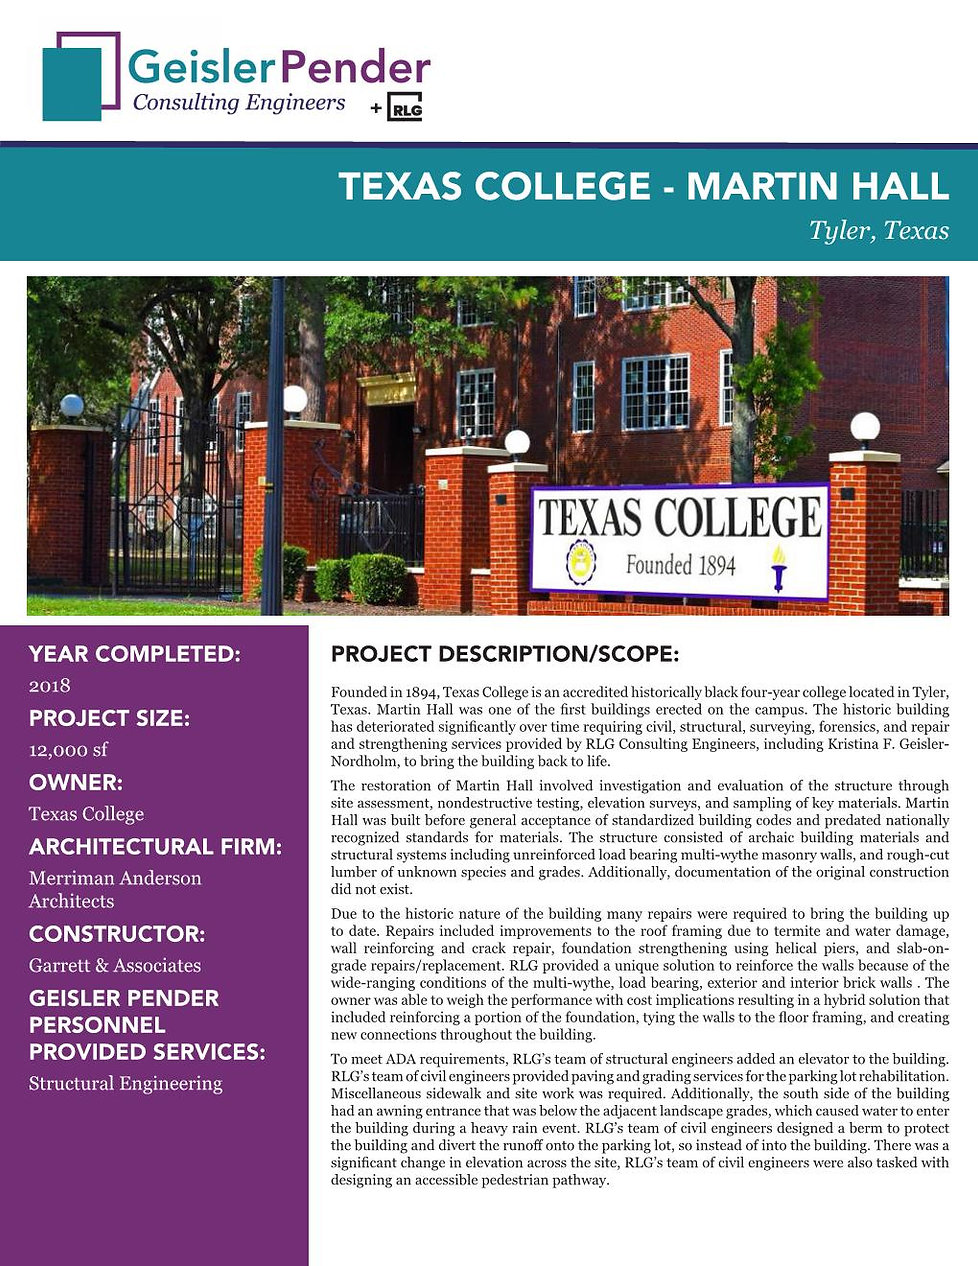 Texas College.jpg